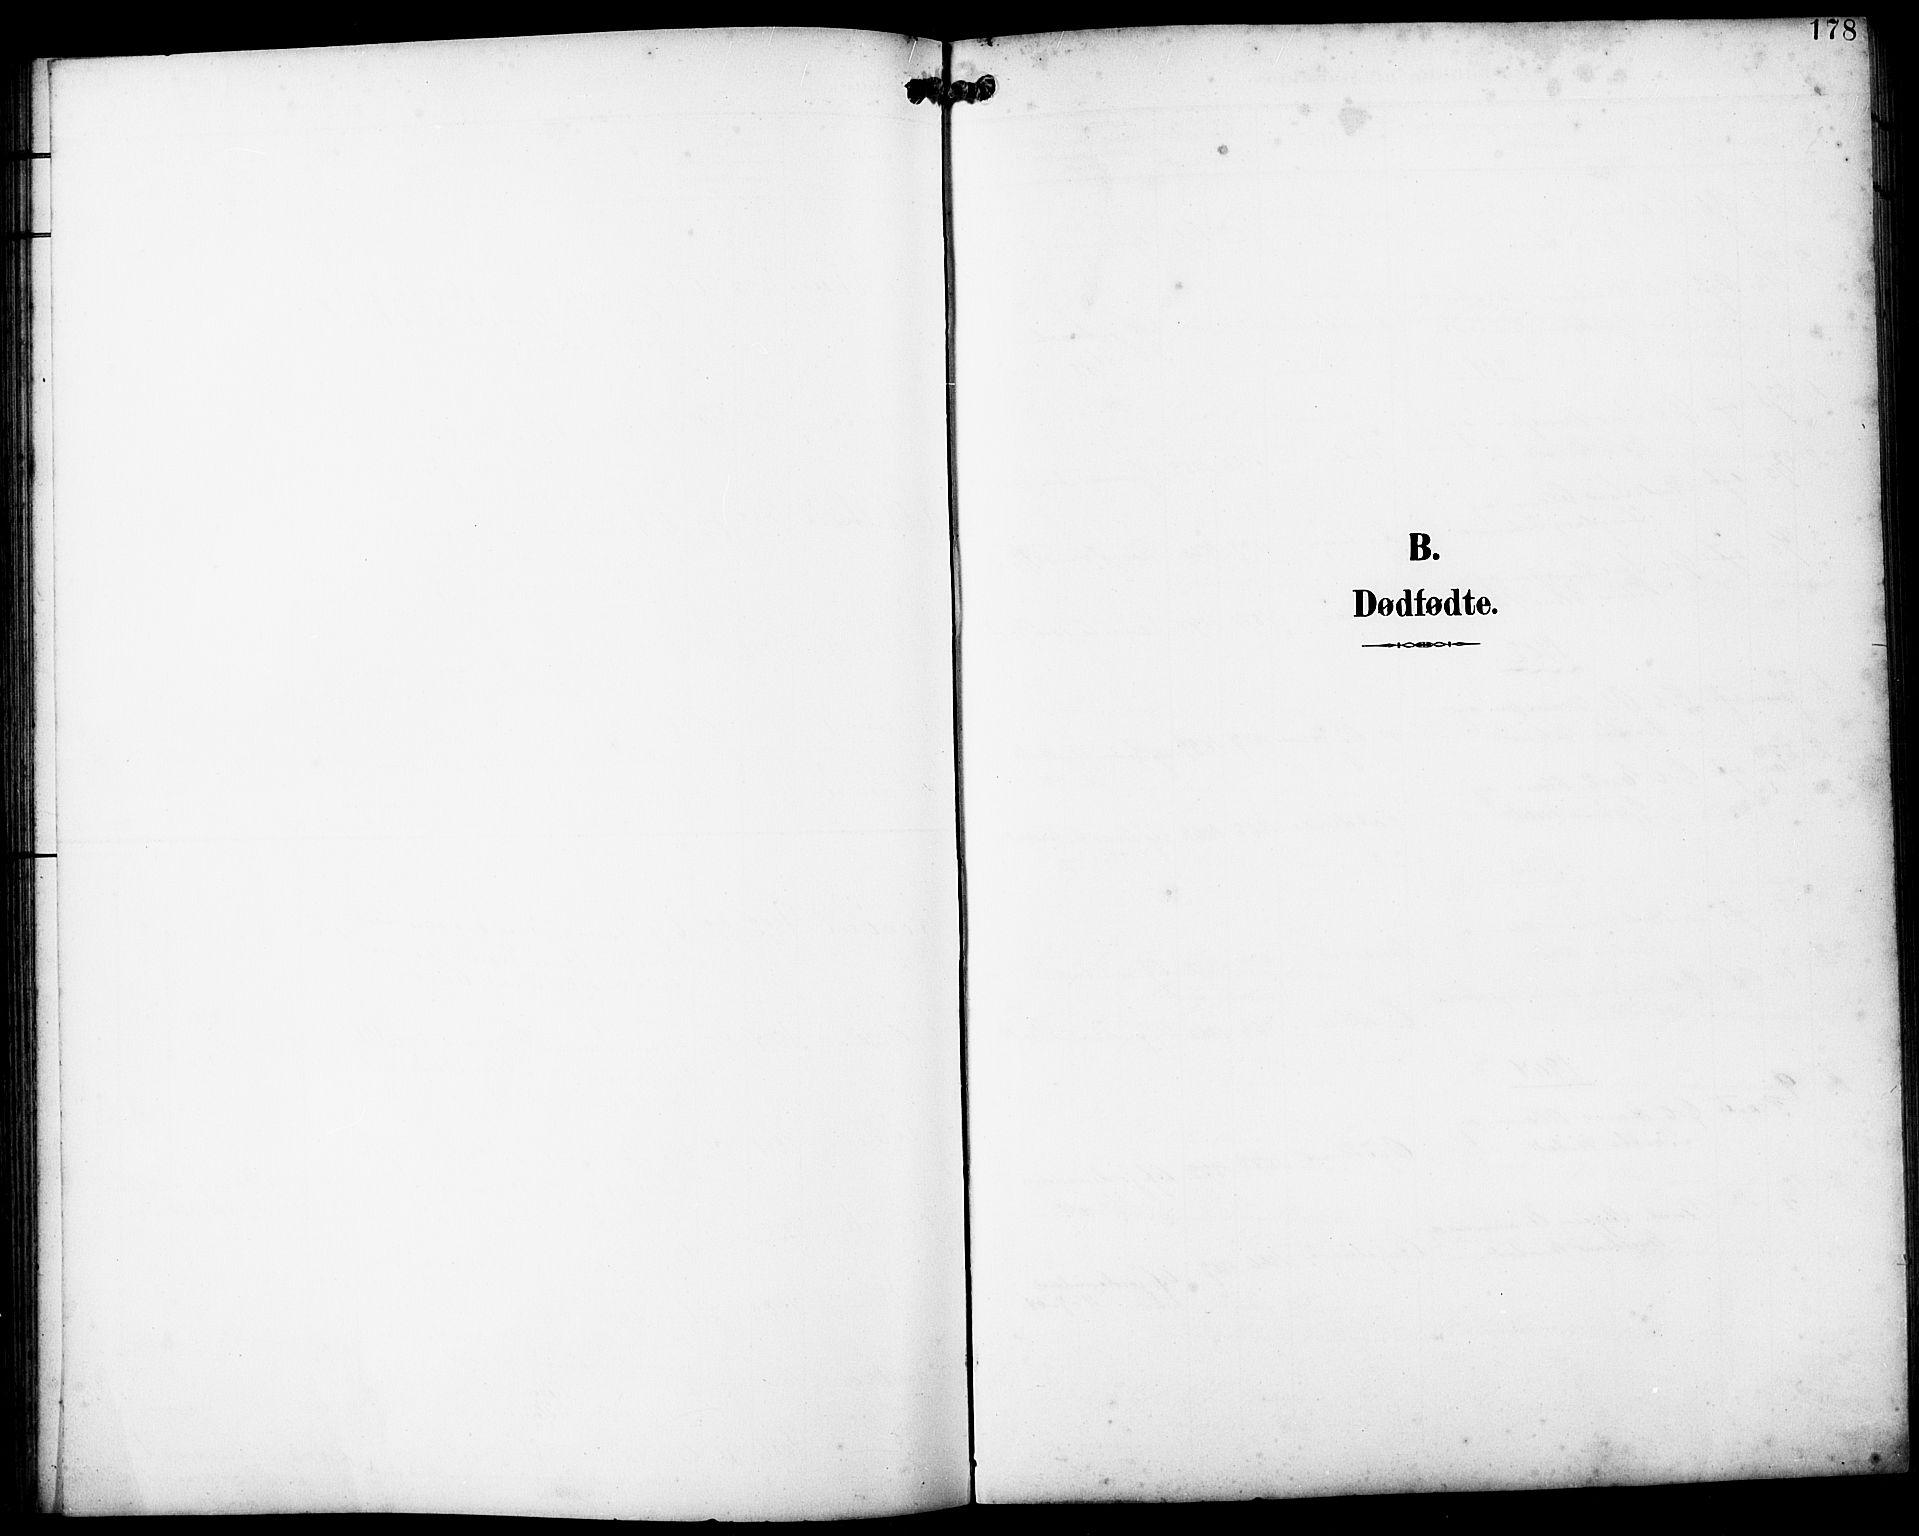 SAB, Fjell sokneprestembete, H/Hab: Klokkerbok nr. A 5, 1899-1918, s. 178